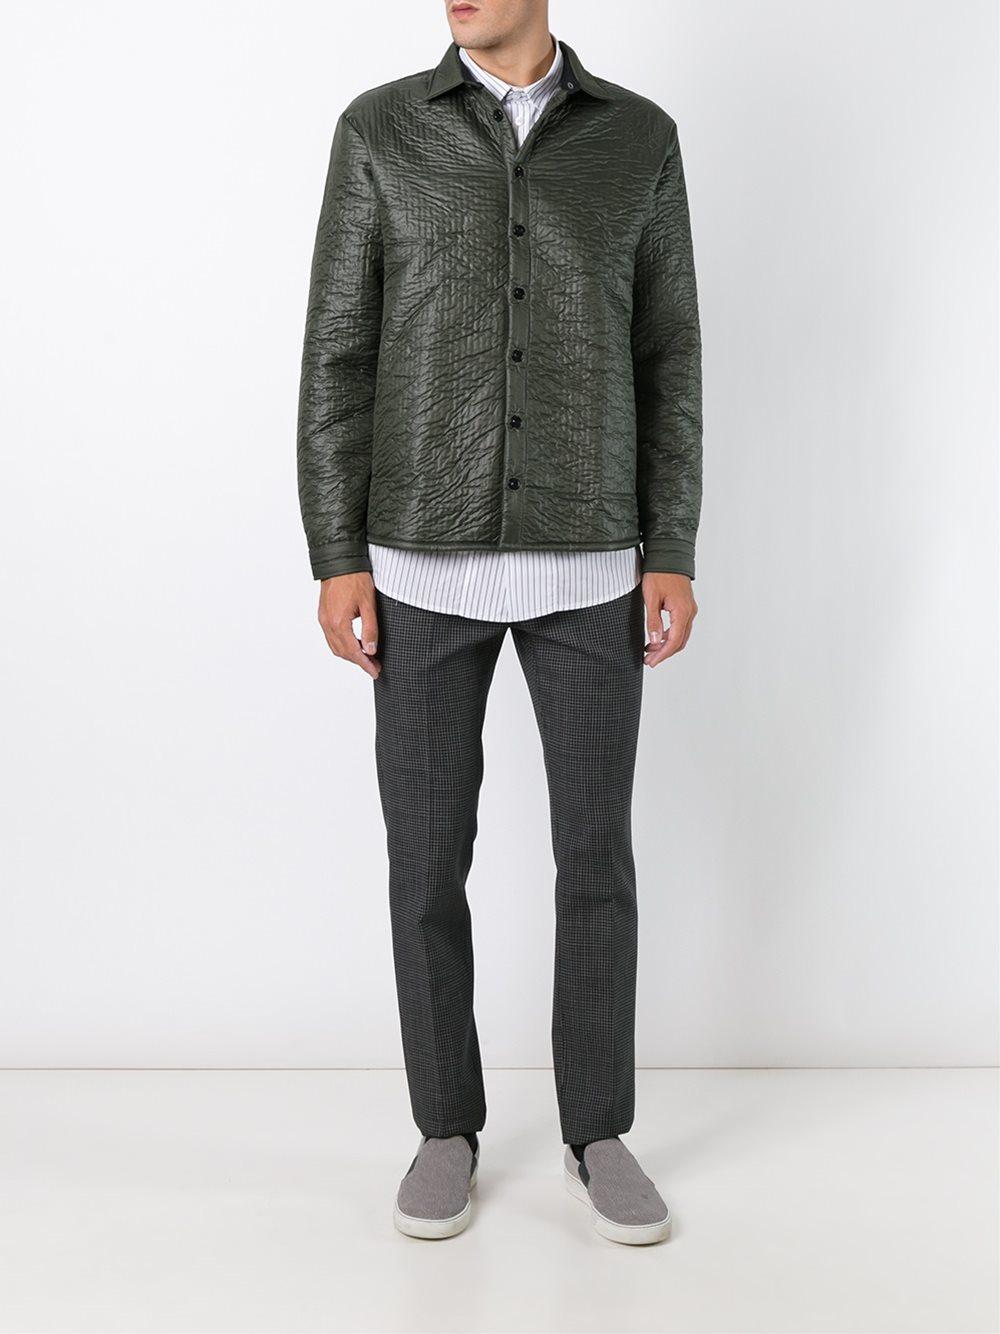 Canada Sanyo Fashion House Jacket